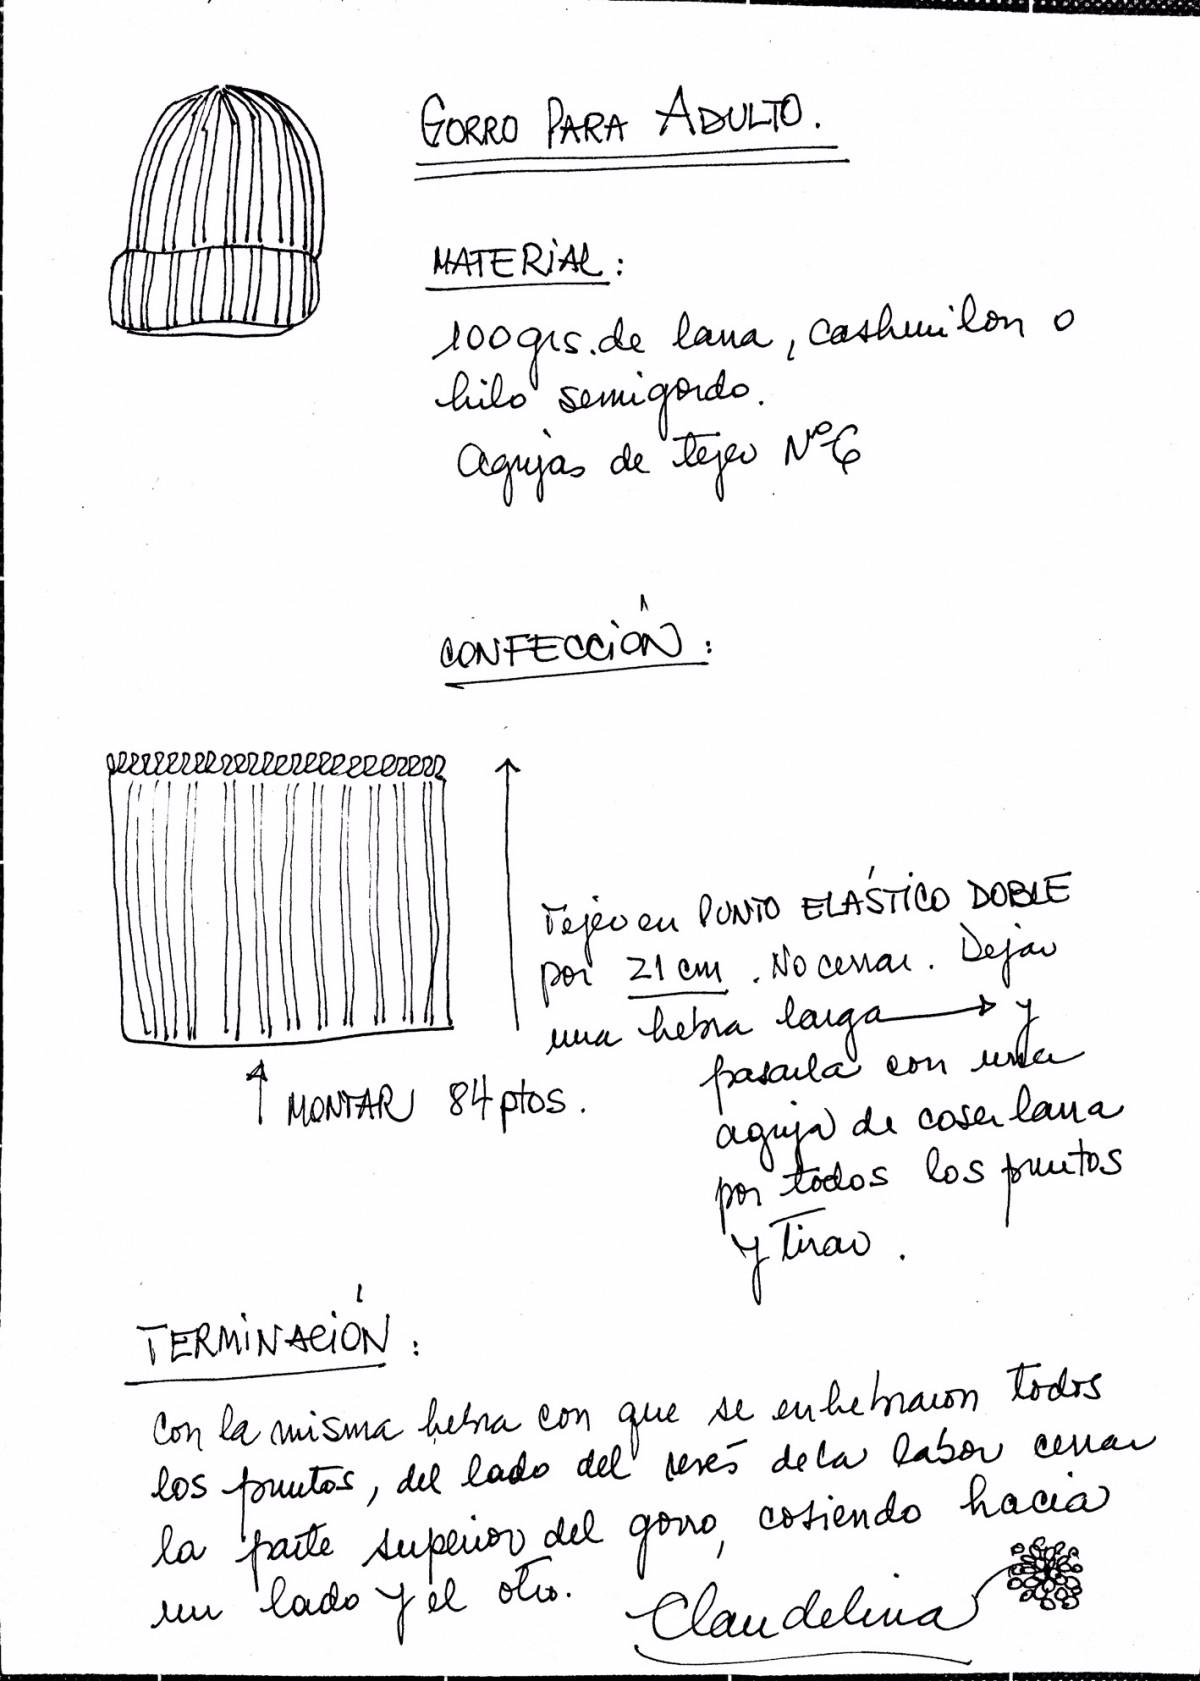 Claud-Donar-gorros (1)